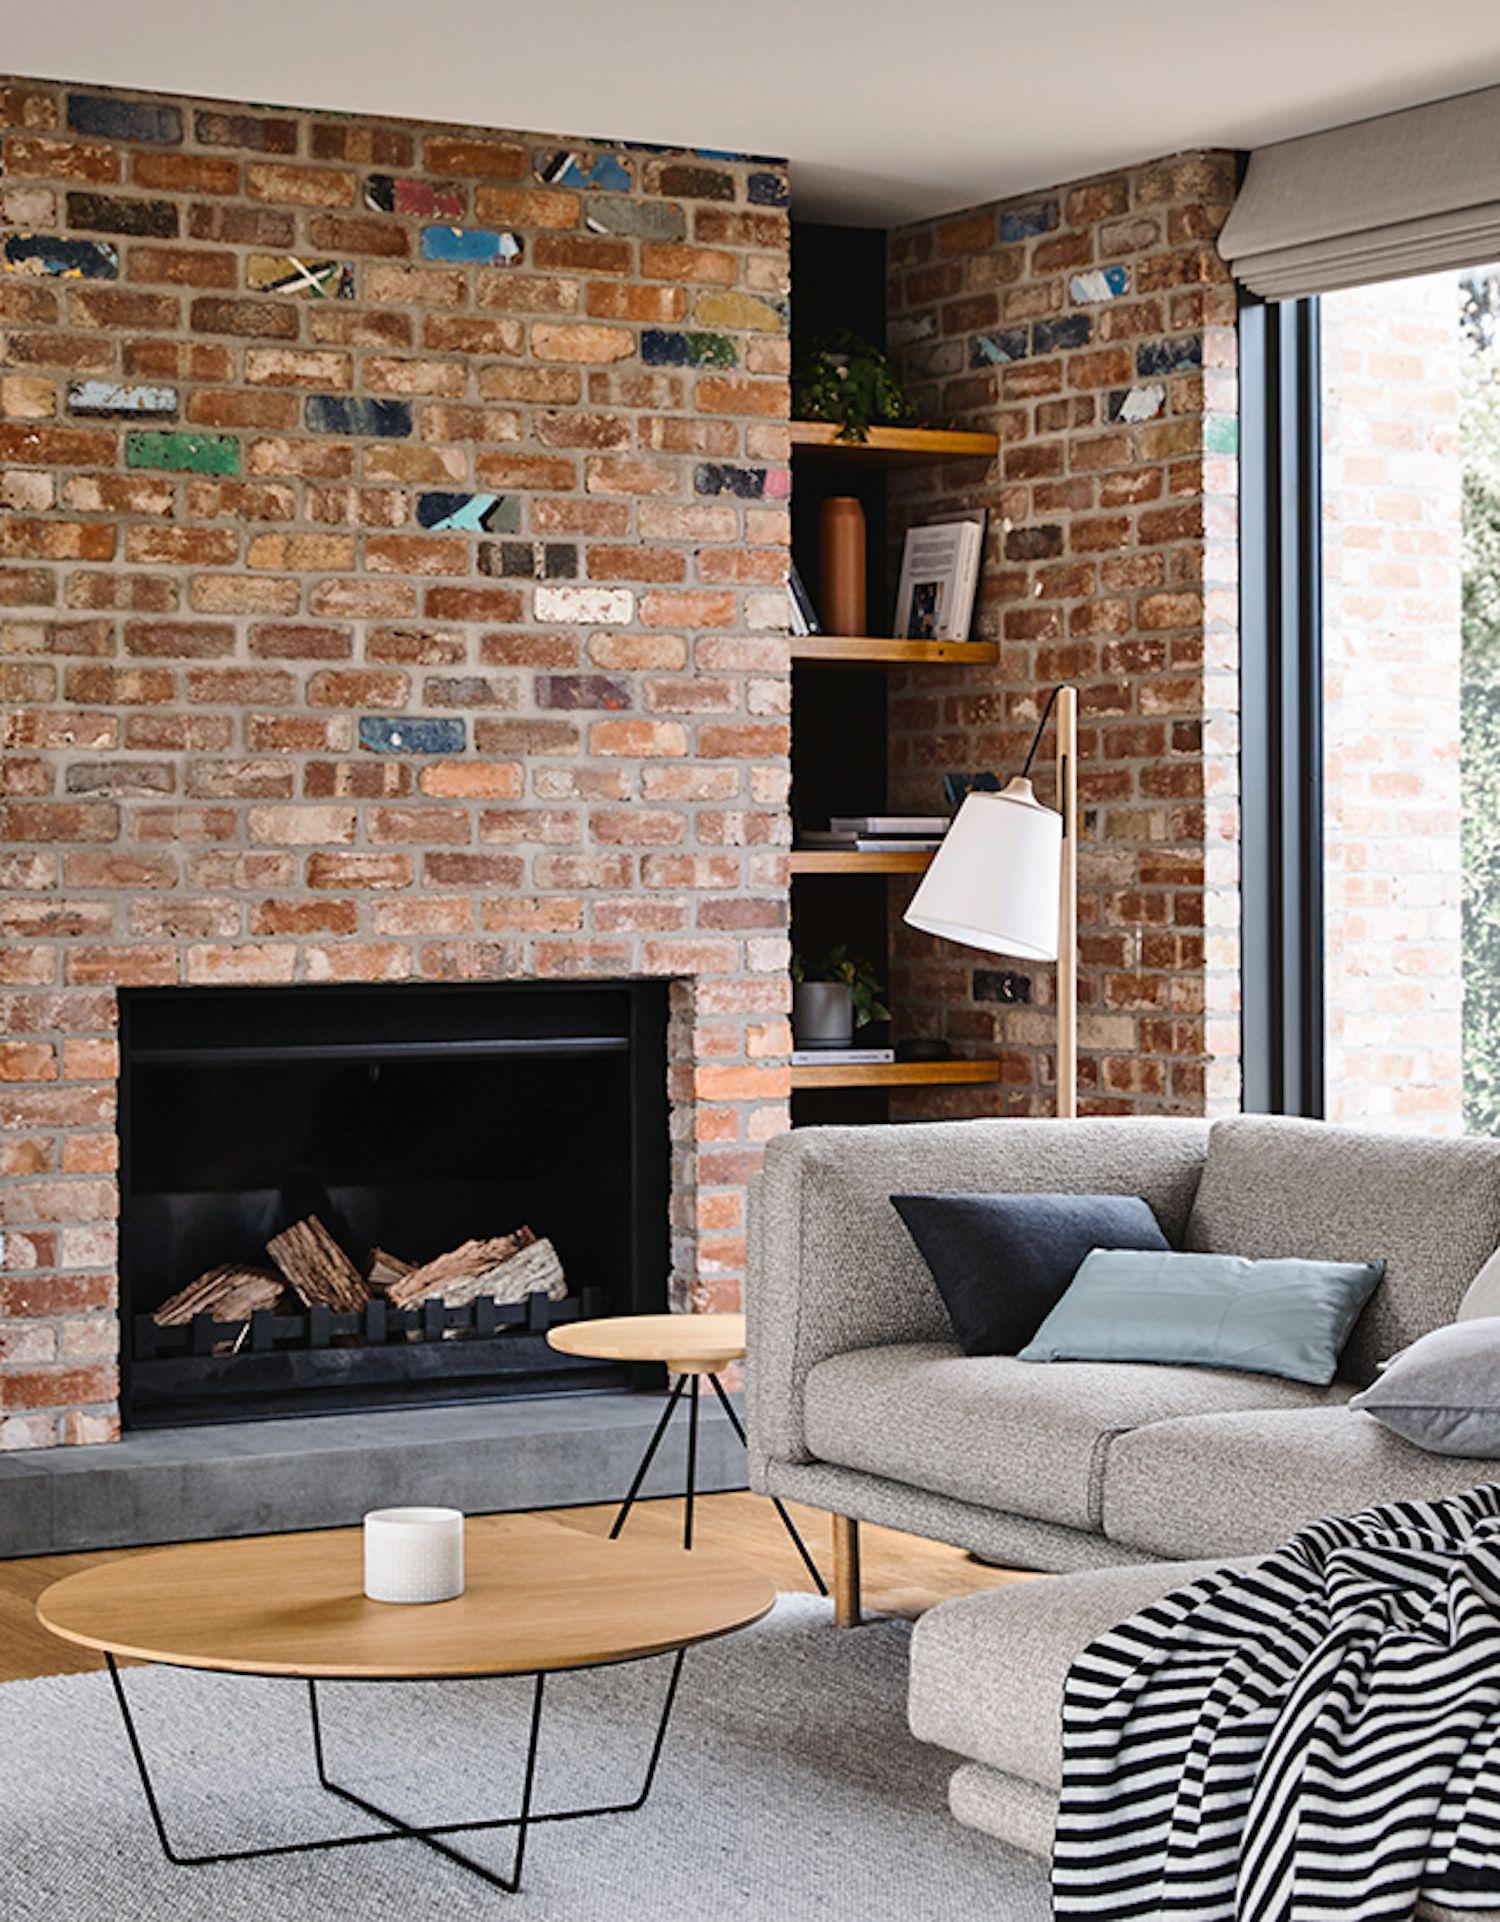 living room | point lonsdale home by inform design | est living, Innenarchitektur ideen